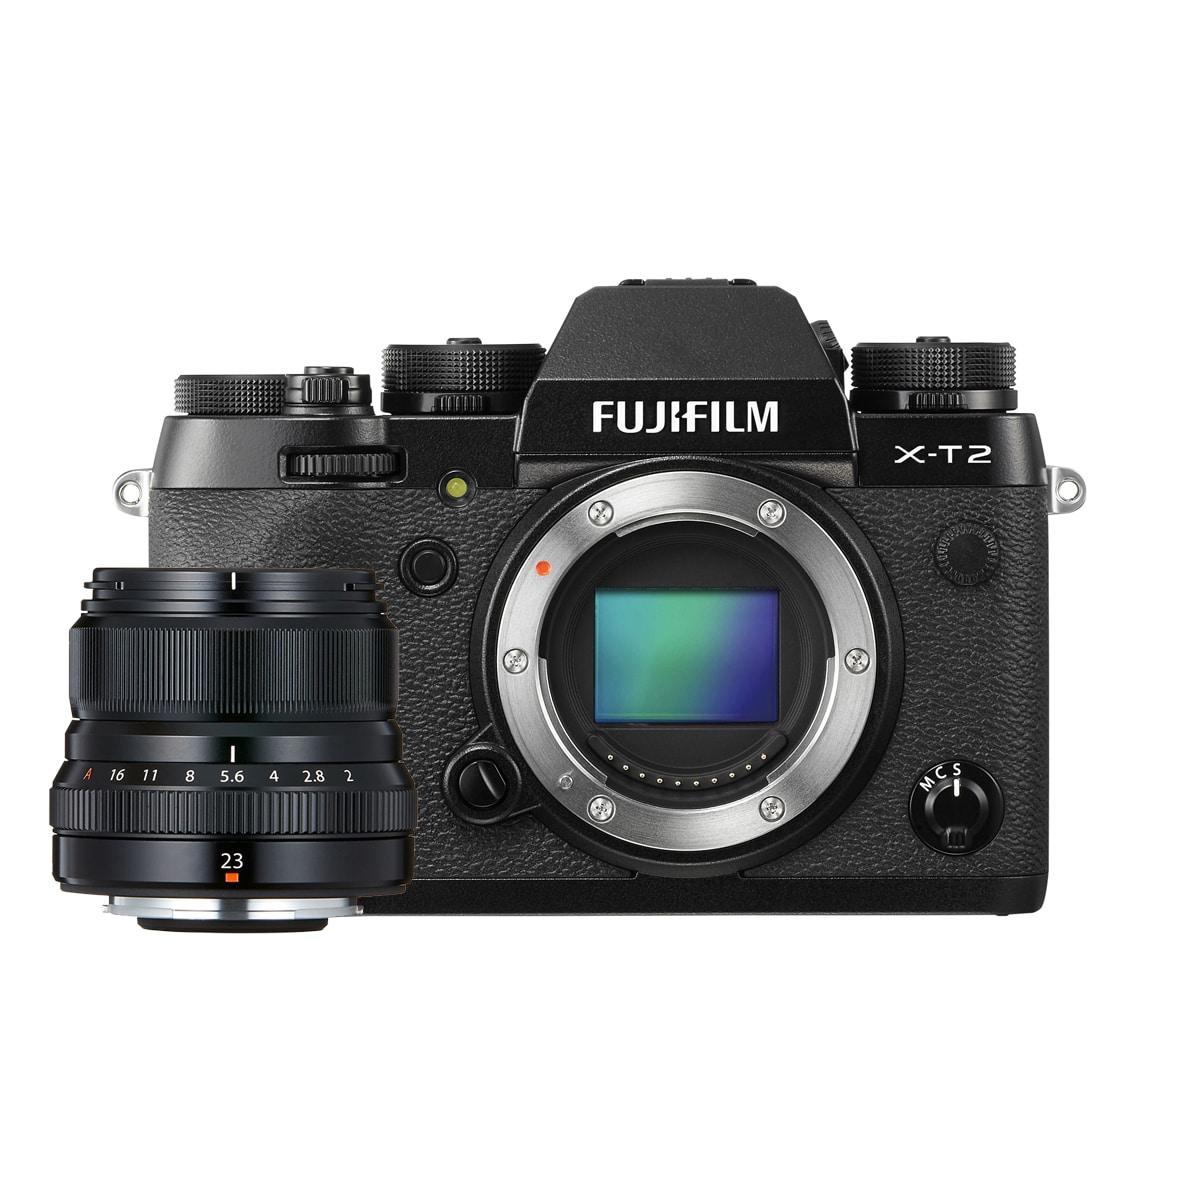 Fujifilm X-T2 + Fujinon 23mm F2 WR